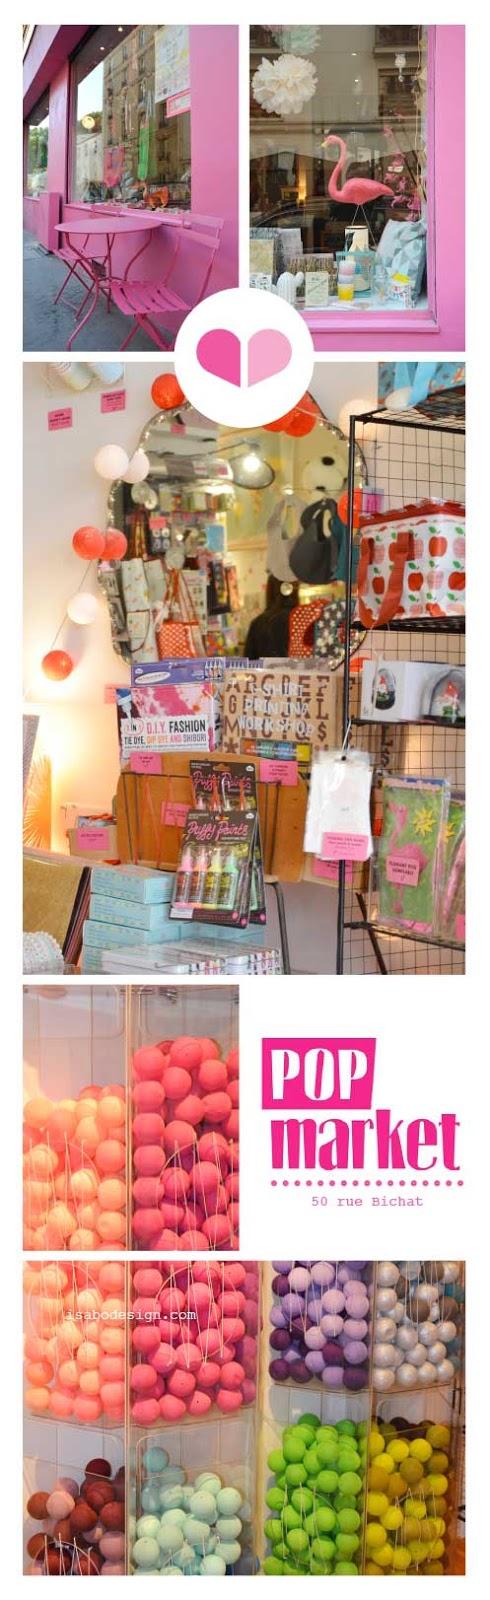 isabo-paris-shopping-pop-market-2